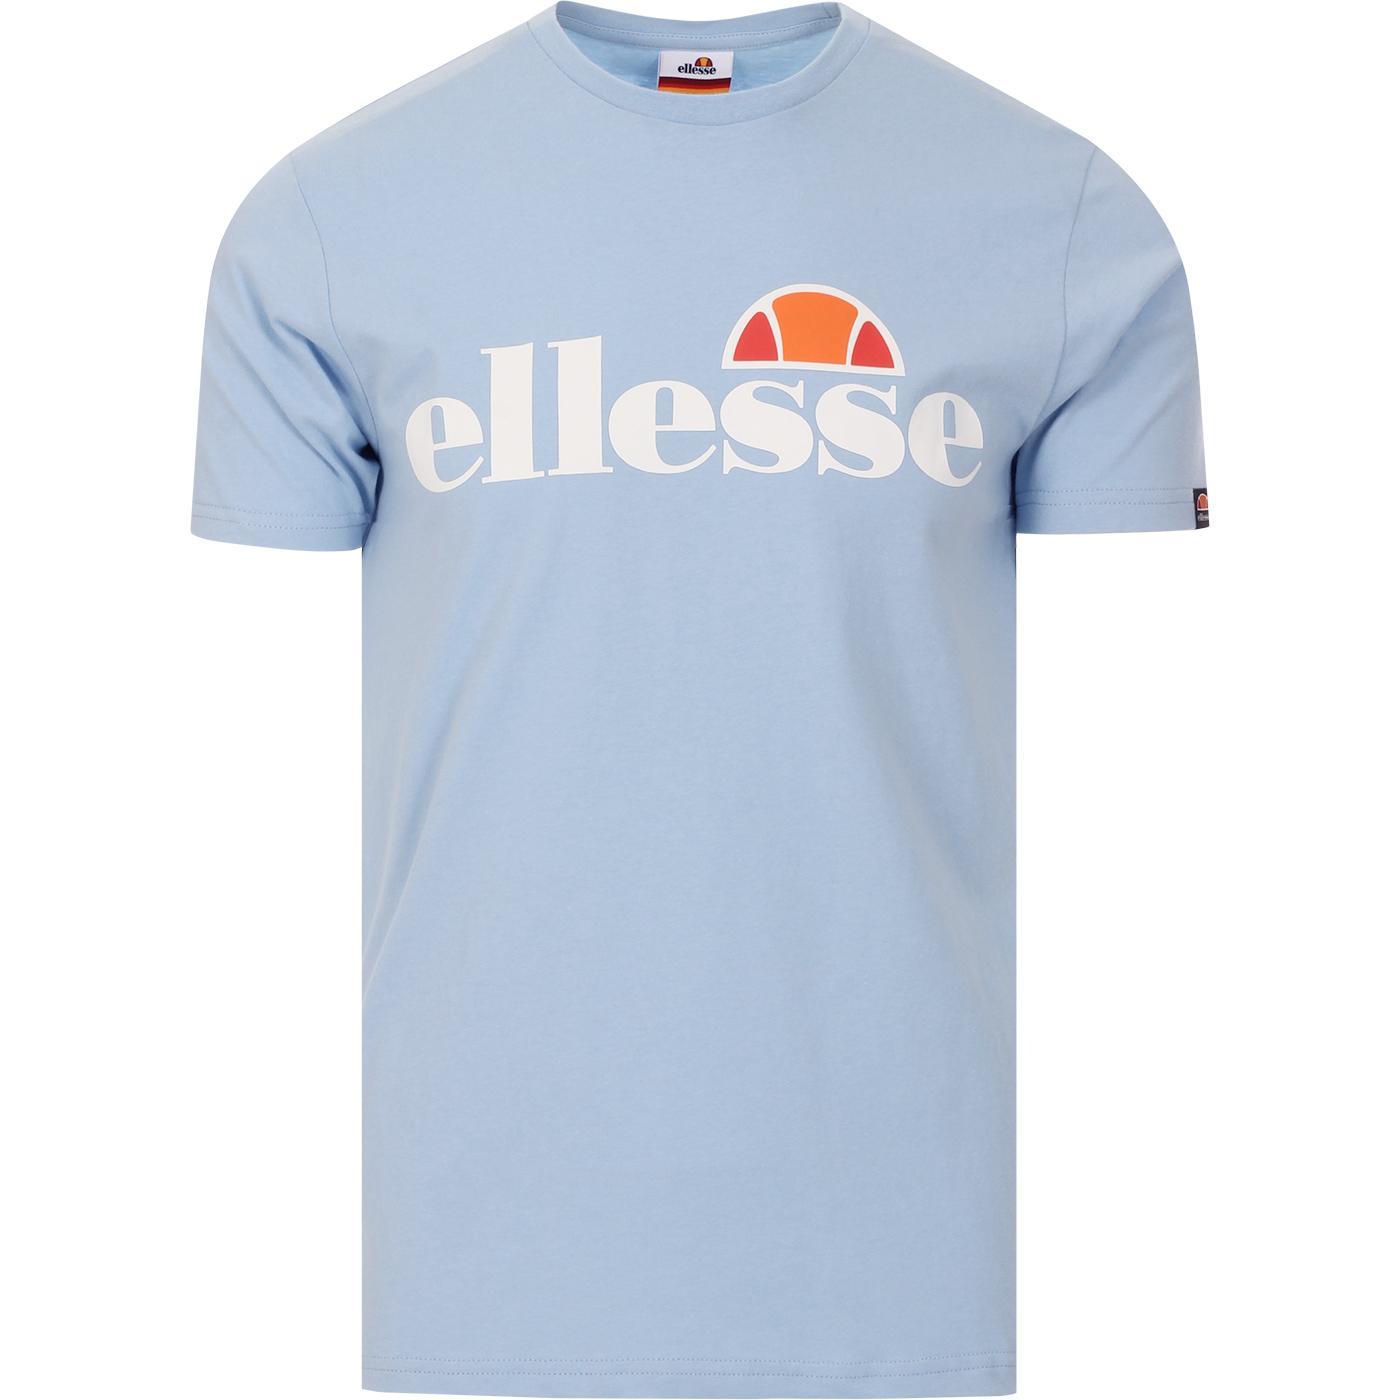 Prado ELLESSE Retro 80s Logo Crew Tee (Light Blue)